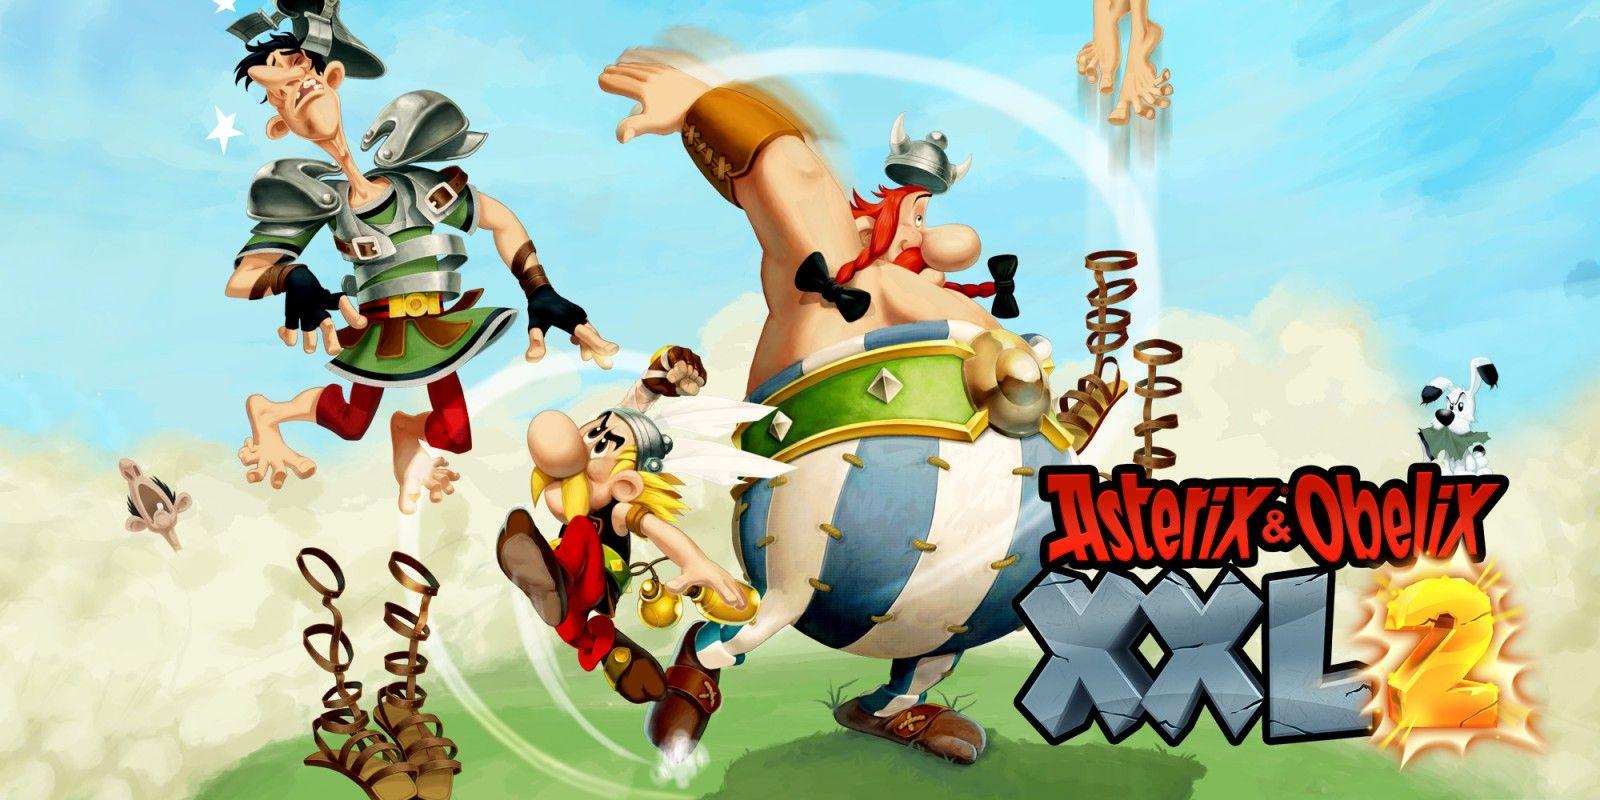 [Nintendo Switch] Asterix & Obelix XXL 2 - £8.09 @ Nintendo eshop